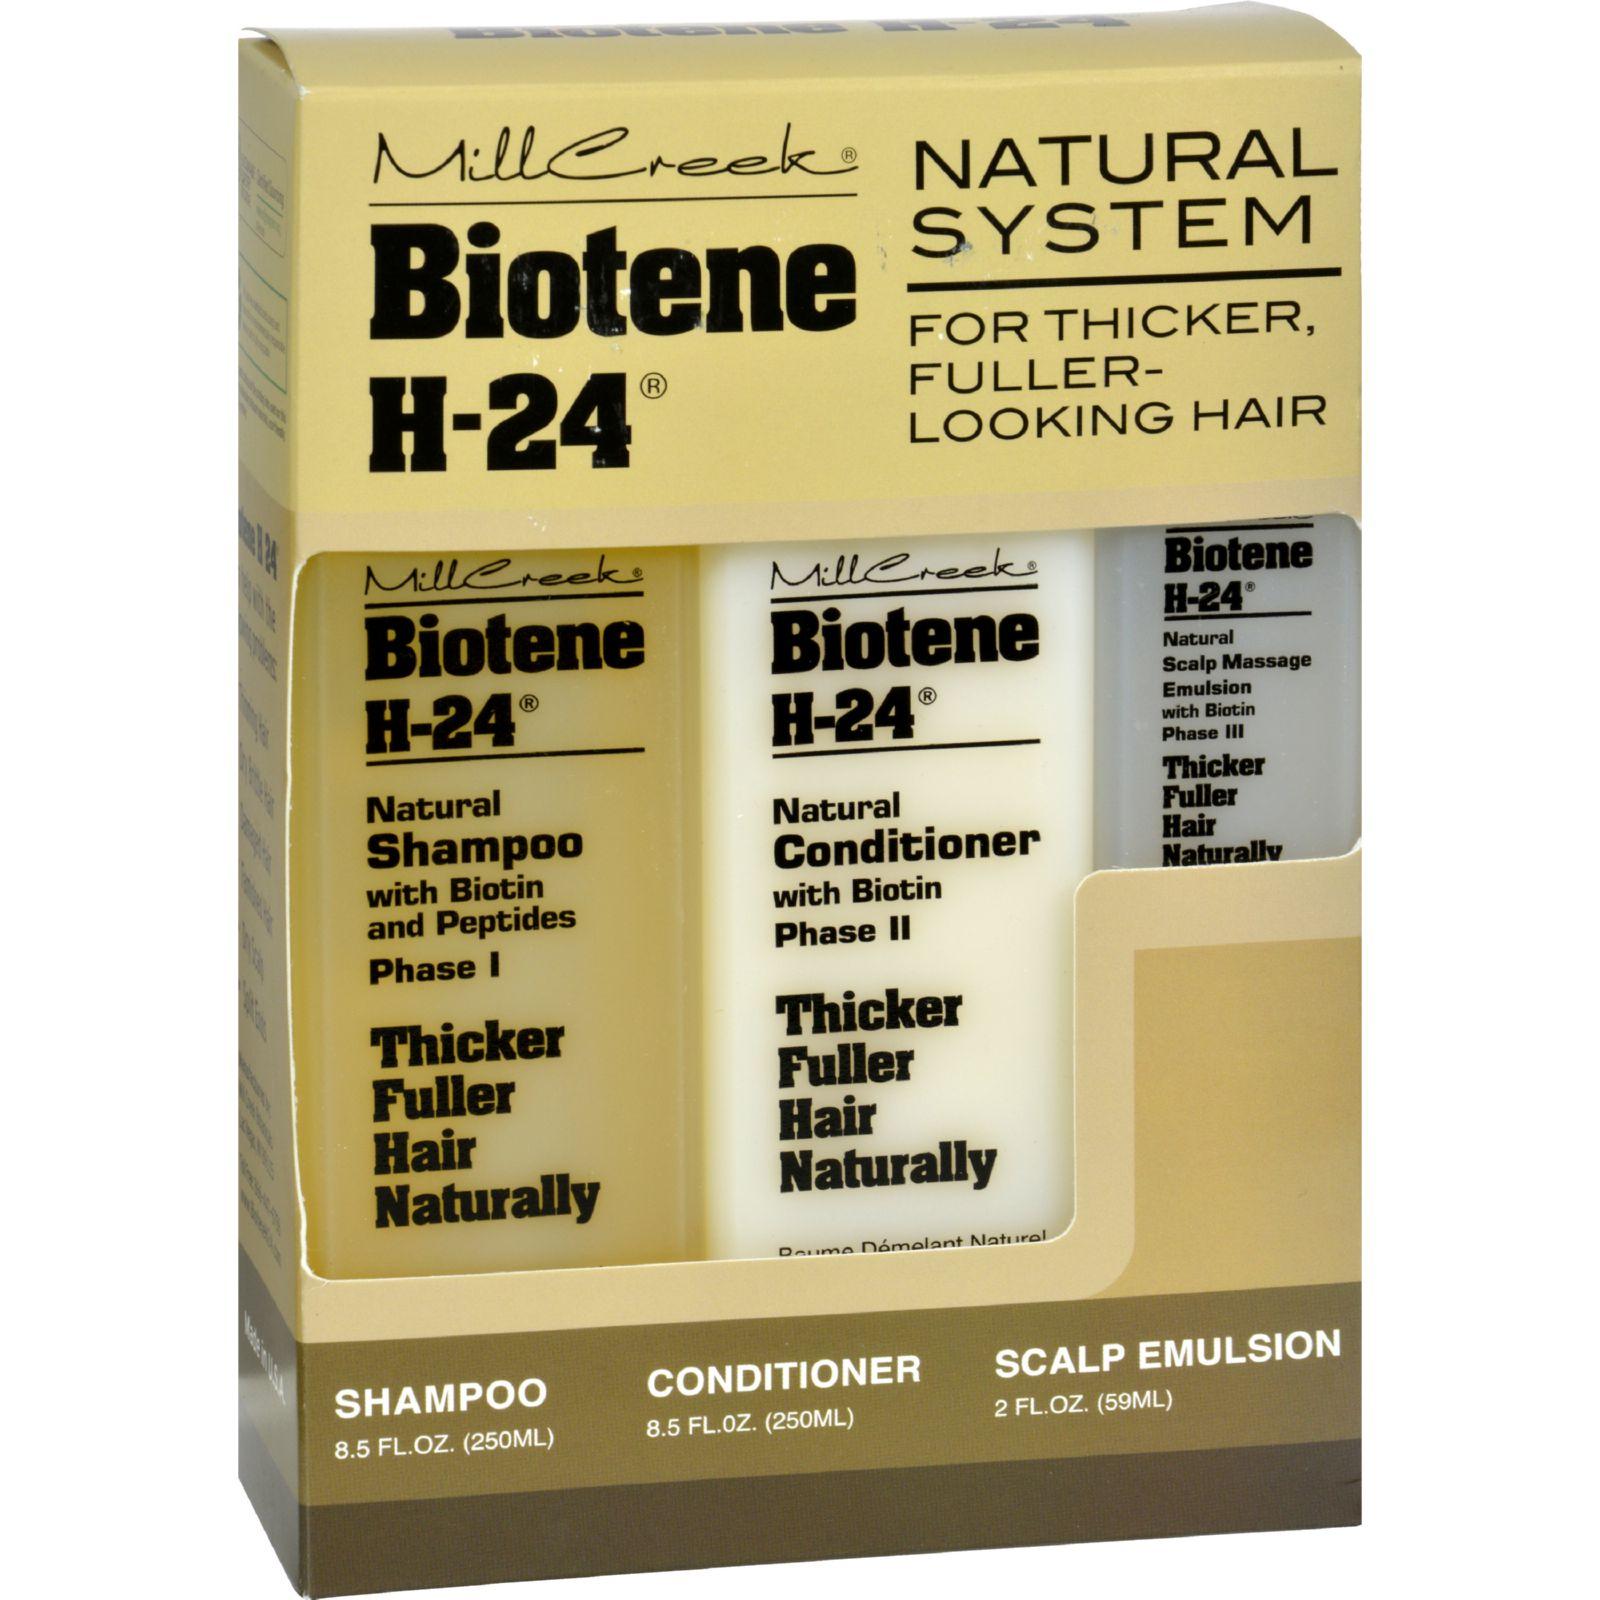 Mill Creek Biotene H-24 Tri-Pack Shampoo Conditioner Scalp Emulsion - 1 Set